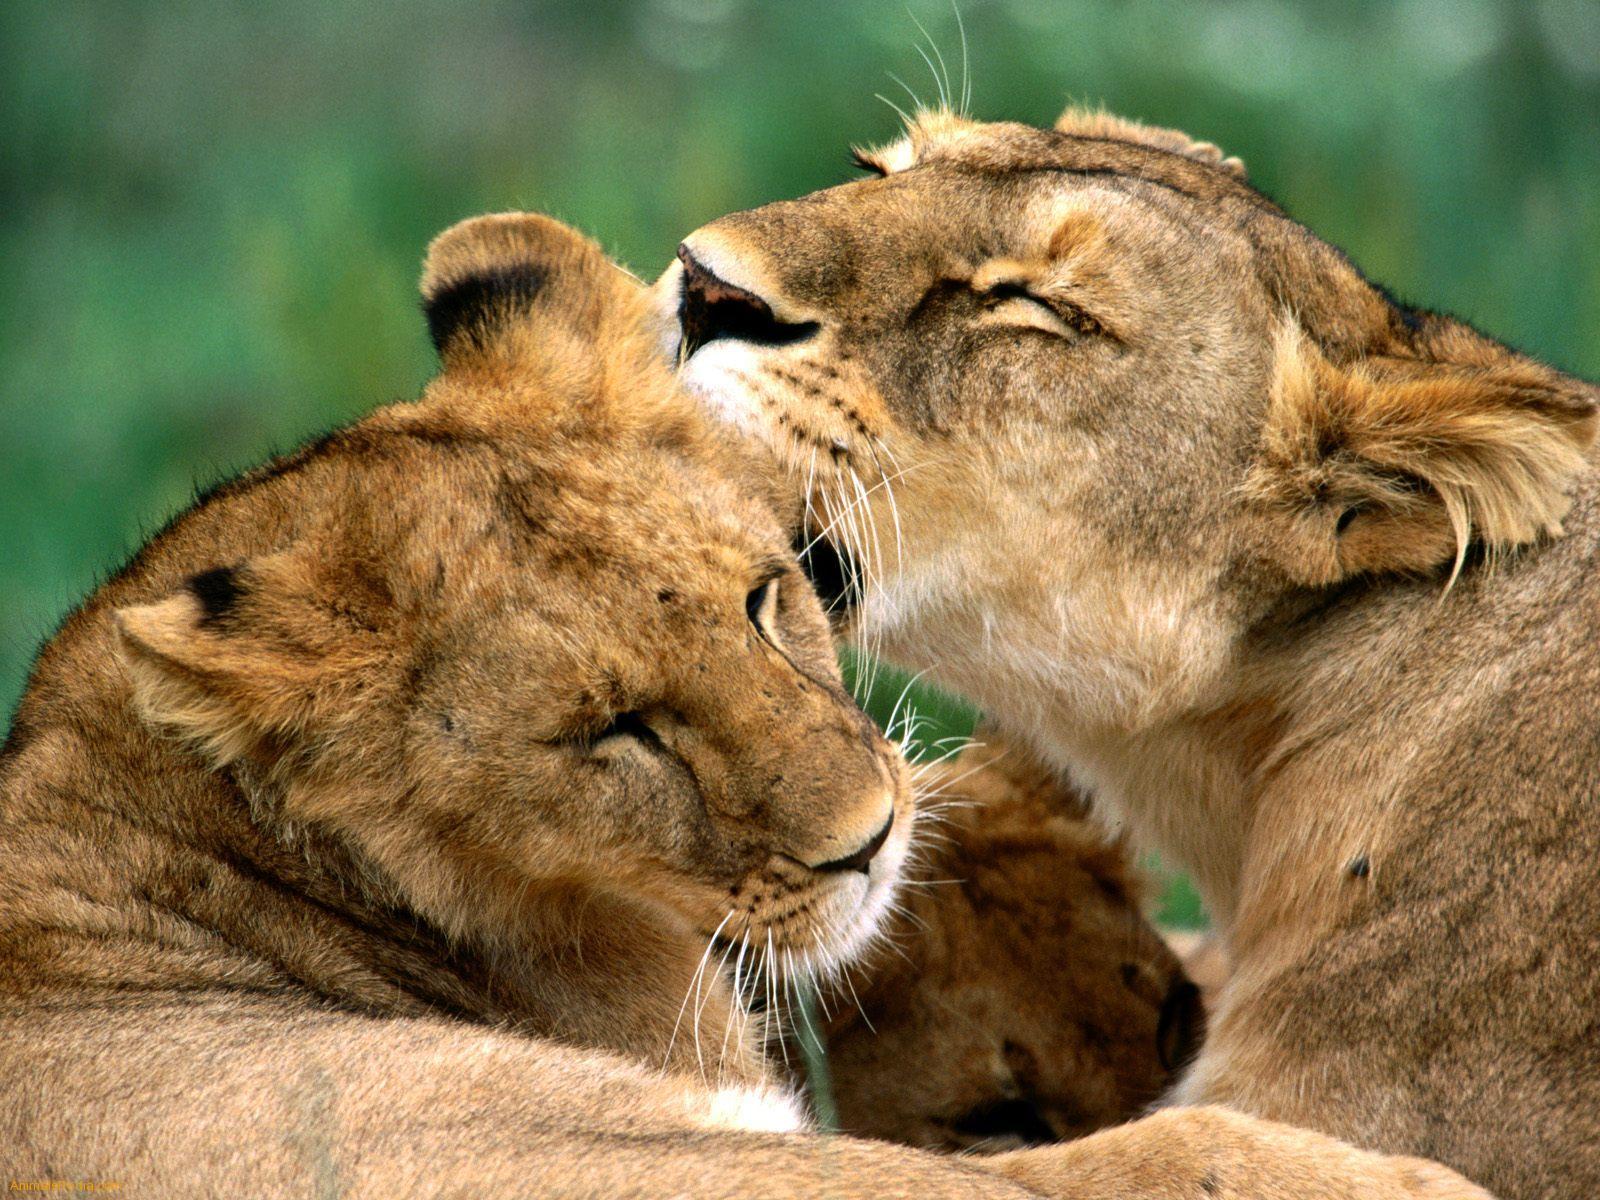 http://4.bp.blogspot.com/-xbvCWjwpwgU/T7K-OGQ1OPI/AAAAAAAAAXM/sOZ0zgz-OF0/s1600/The-best-top-desktop-lion-wallpapers-hd-lion-wallpaper-9.jpeg